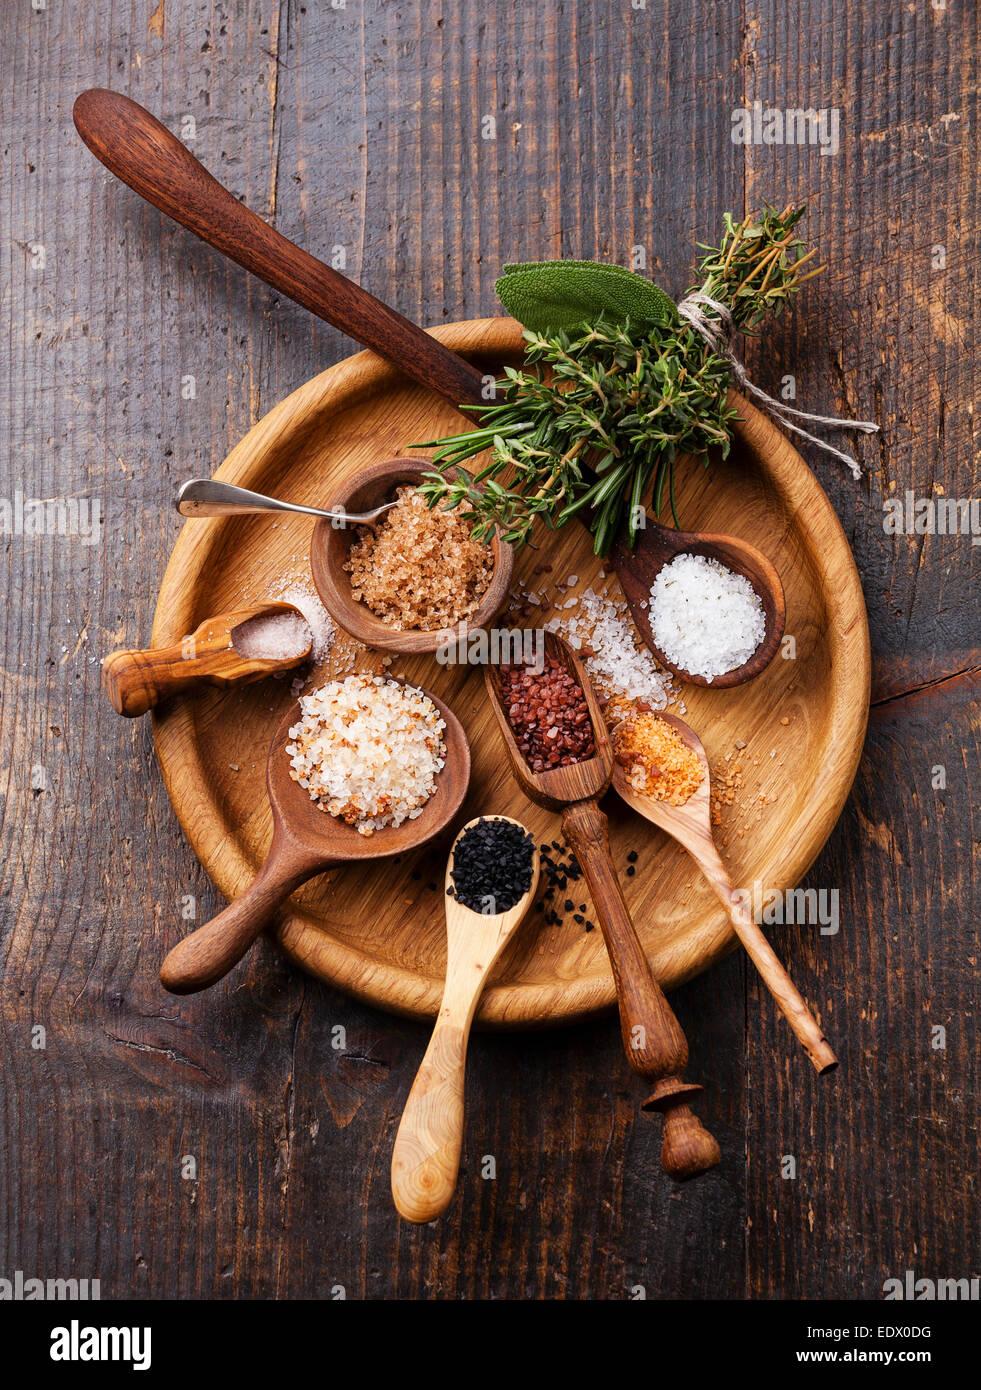 Los diferentes tipos de comida sal gruesa en cucharas de madera sobre fondo oscuro Imagen De Stock